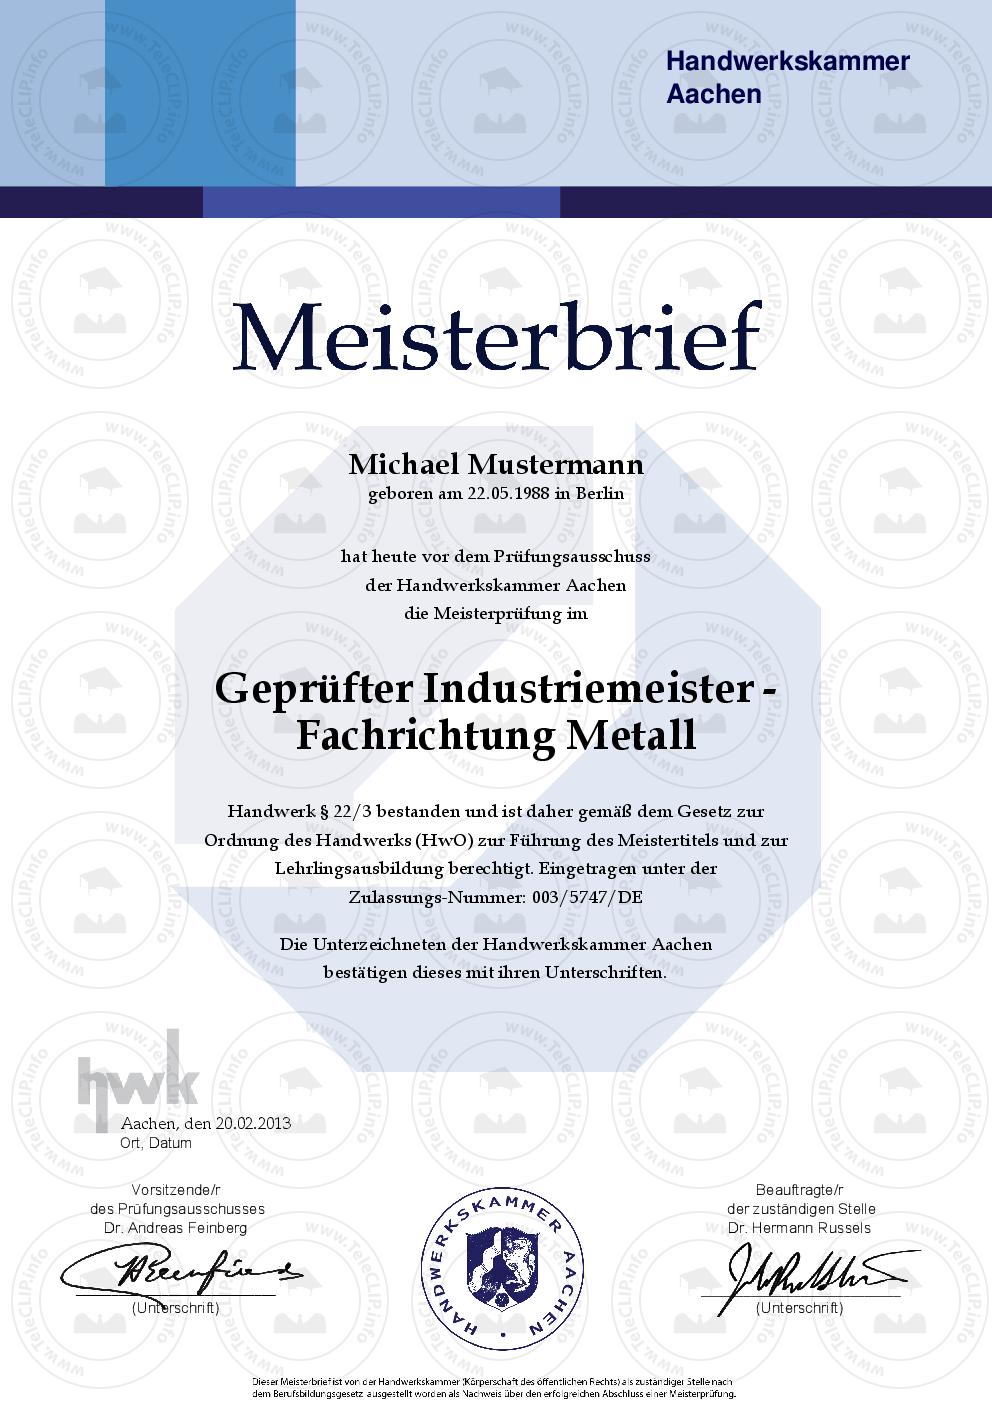 hwk_meisterbrief_2